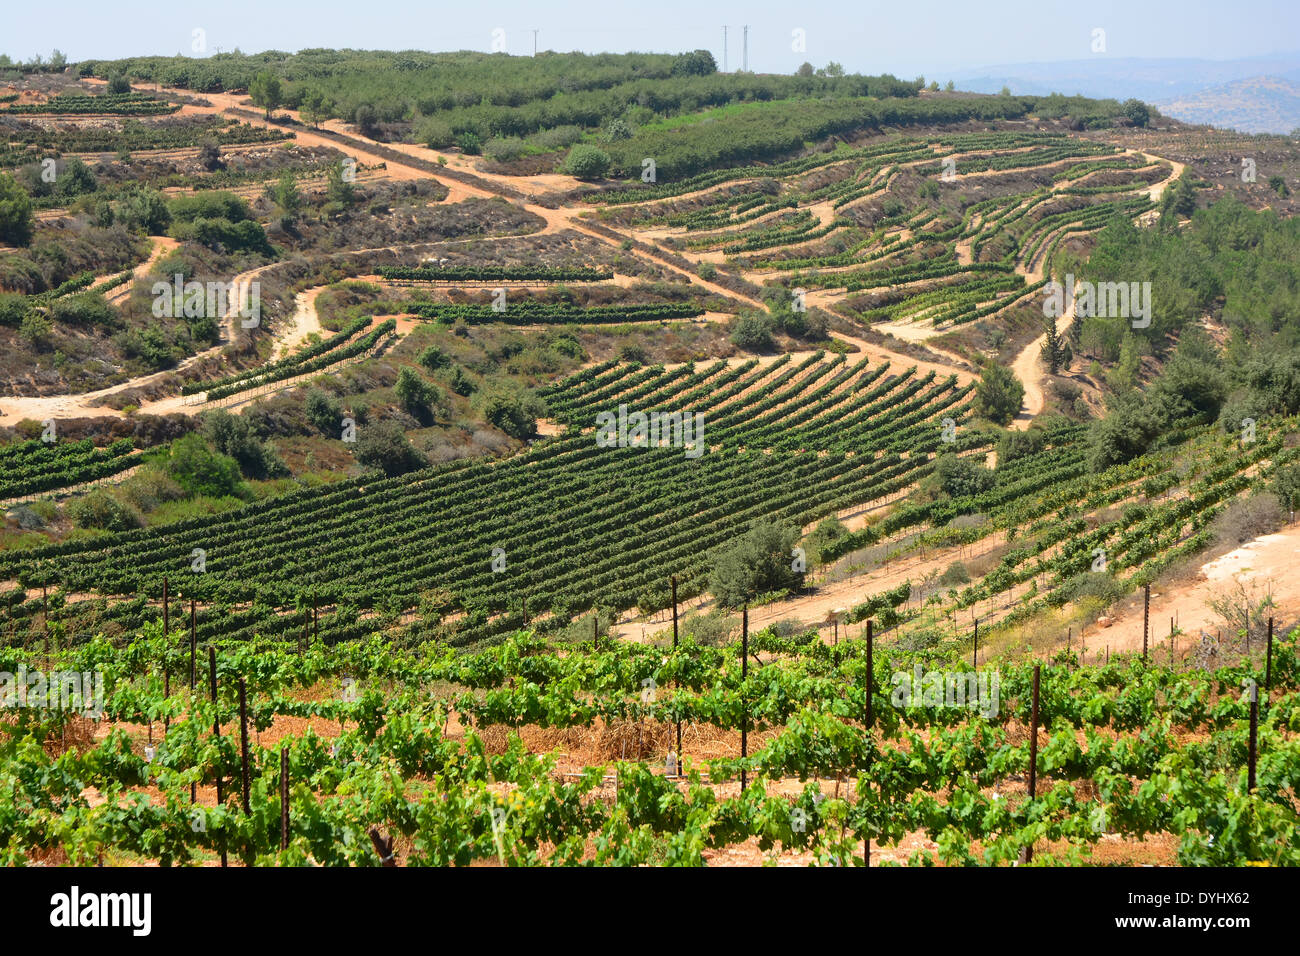 Vineyards In Gush Etzion, Israel - Stock Image